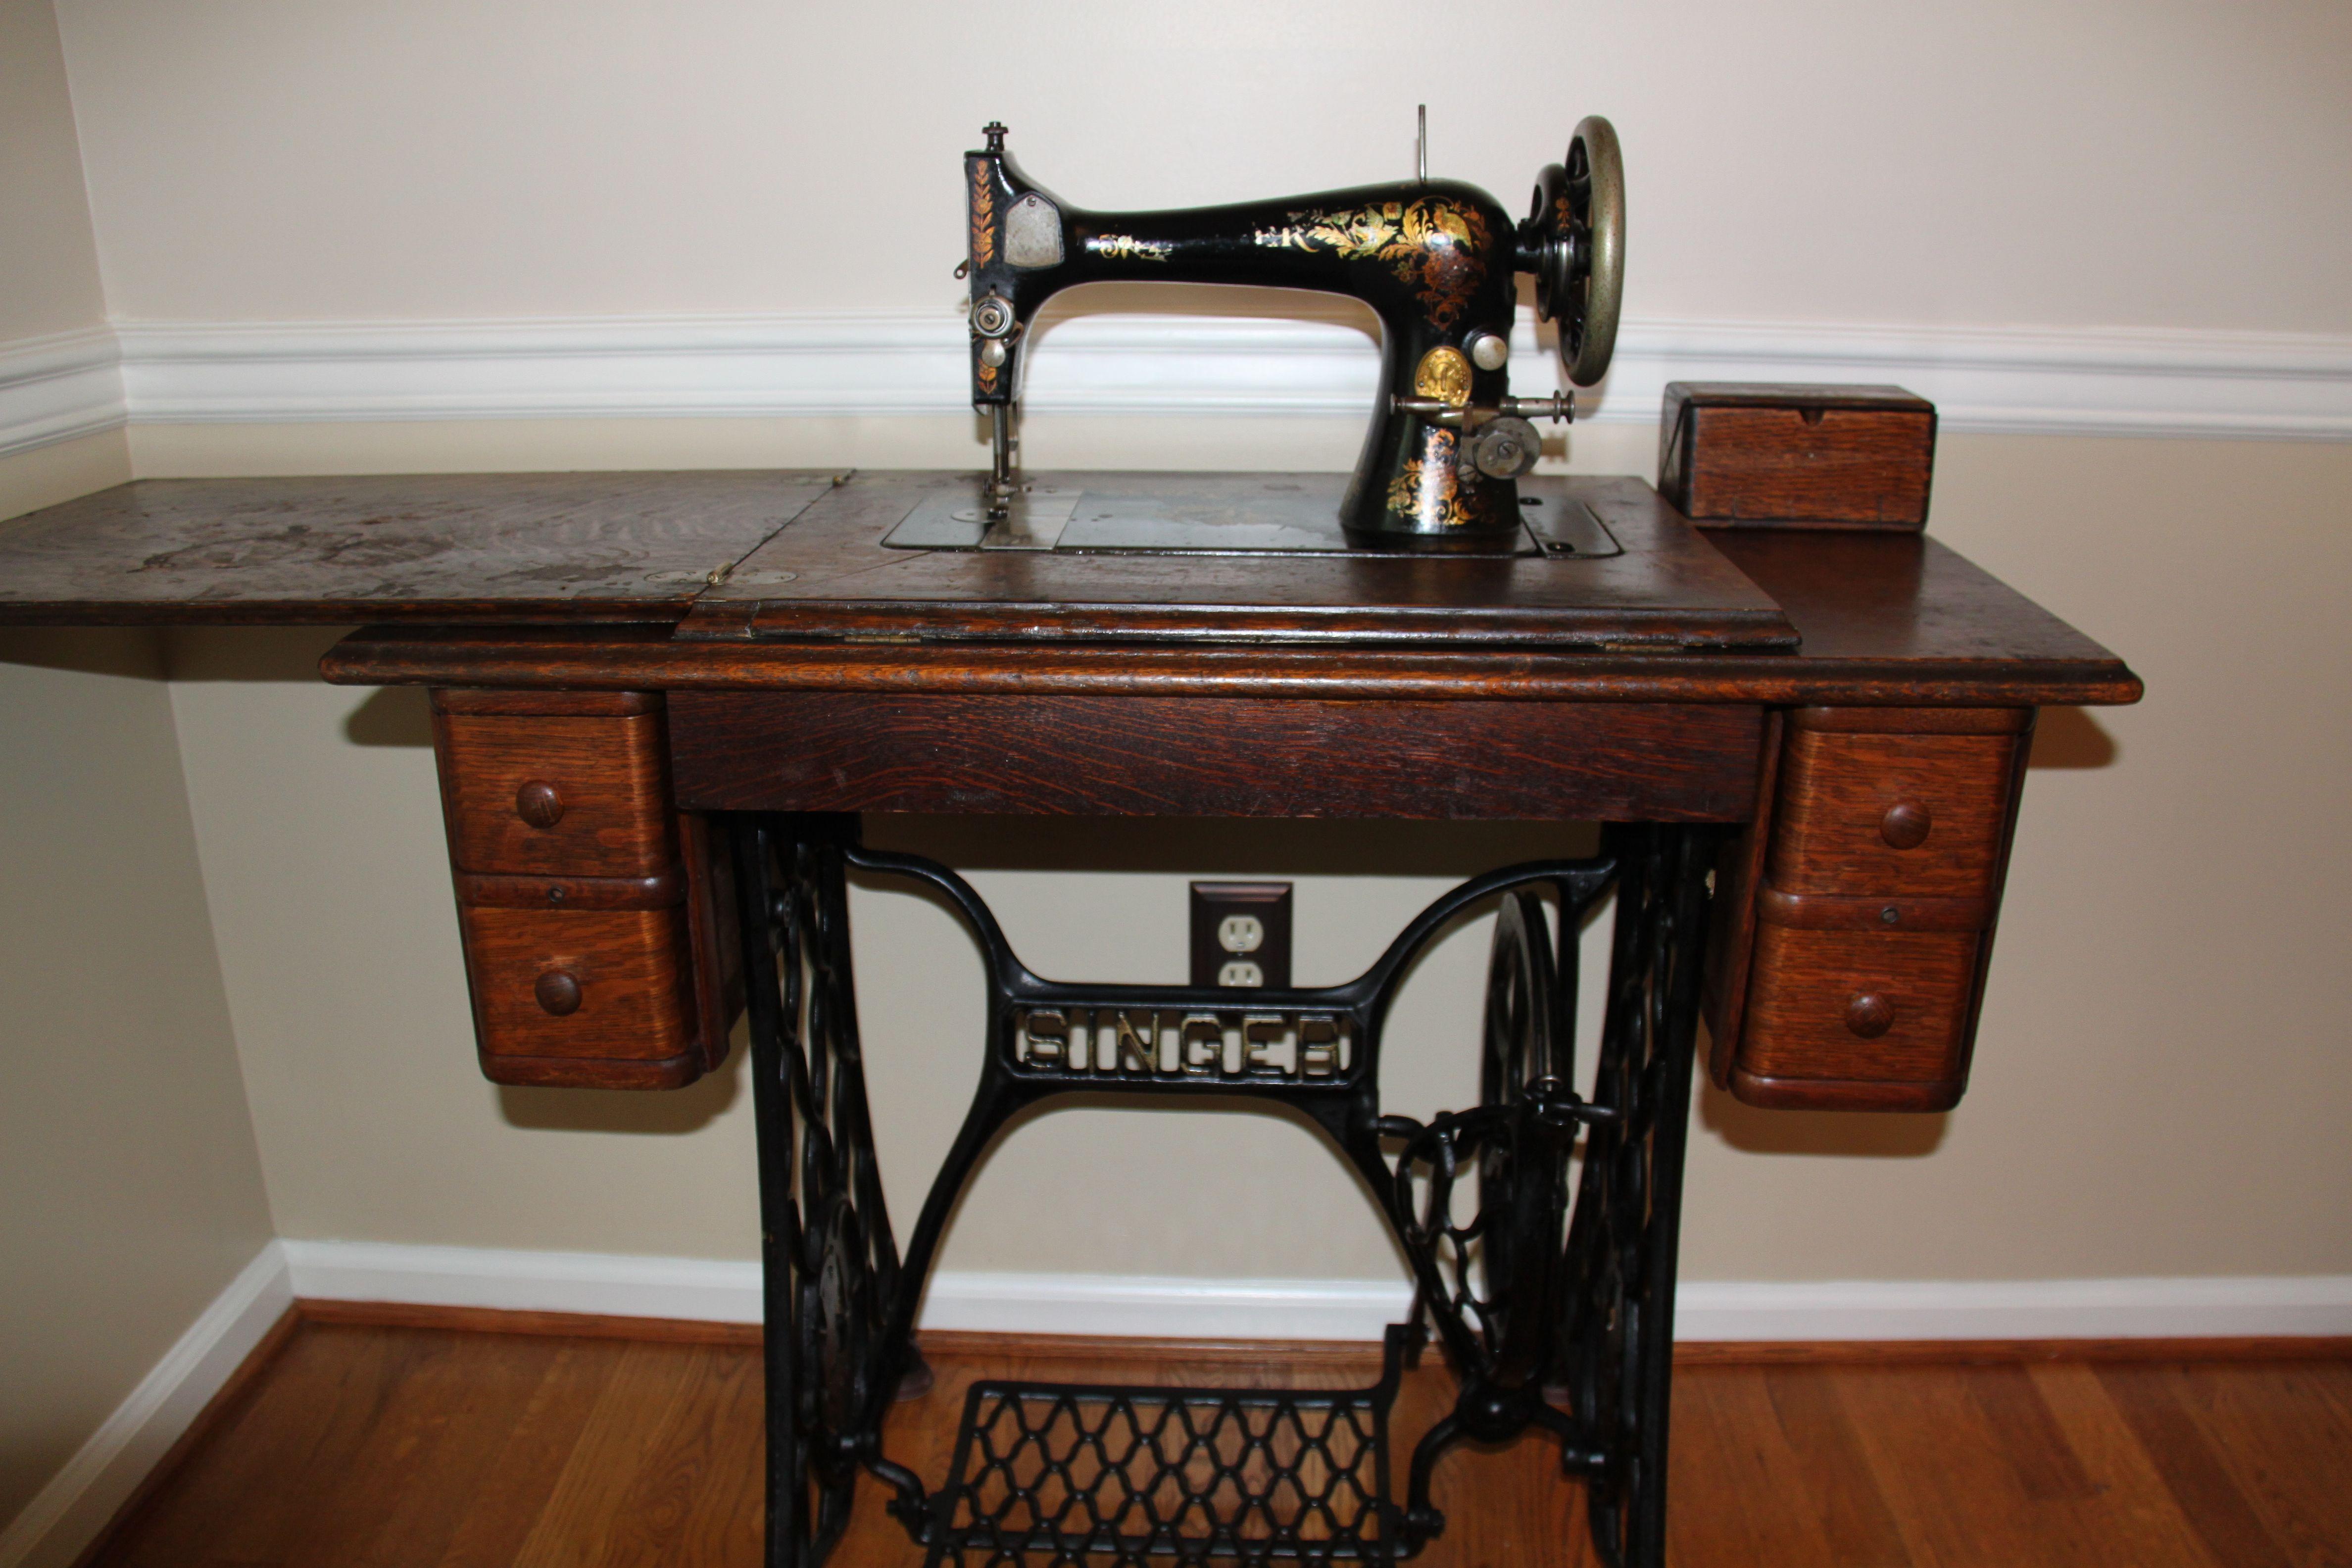 singer sewing machine model 27 value